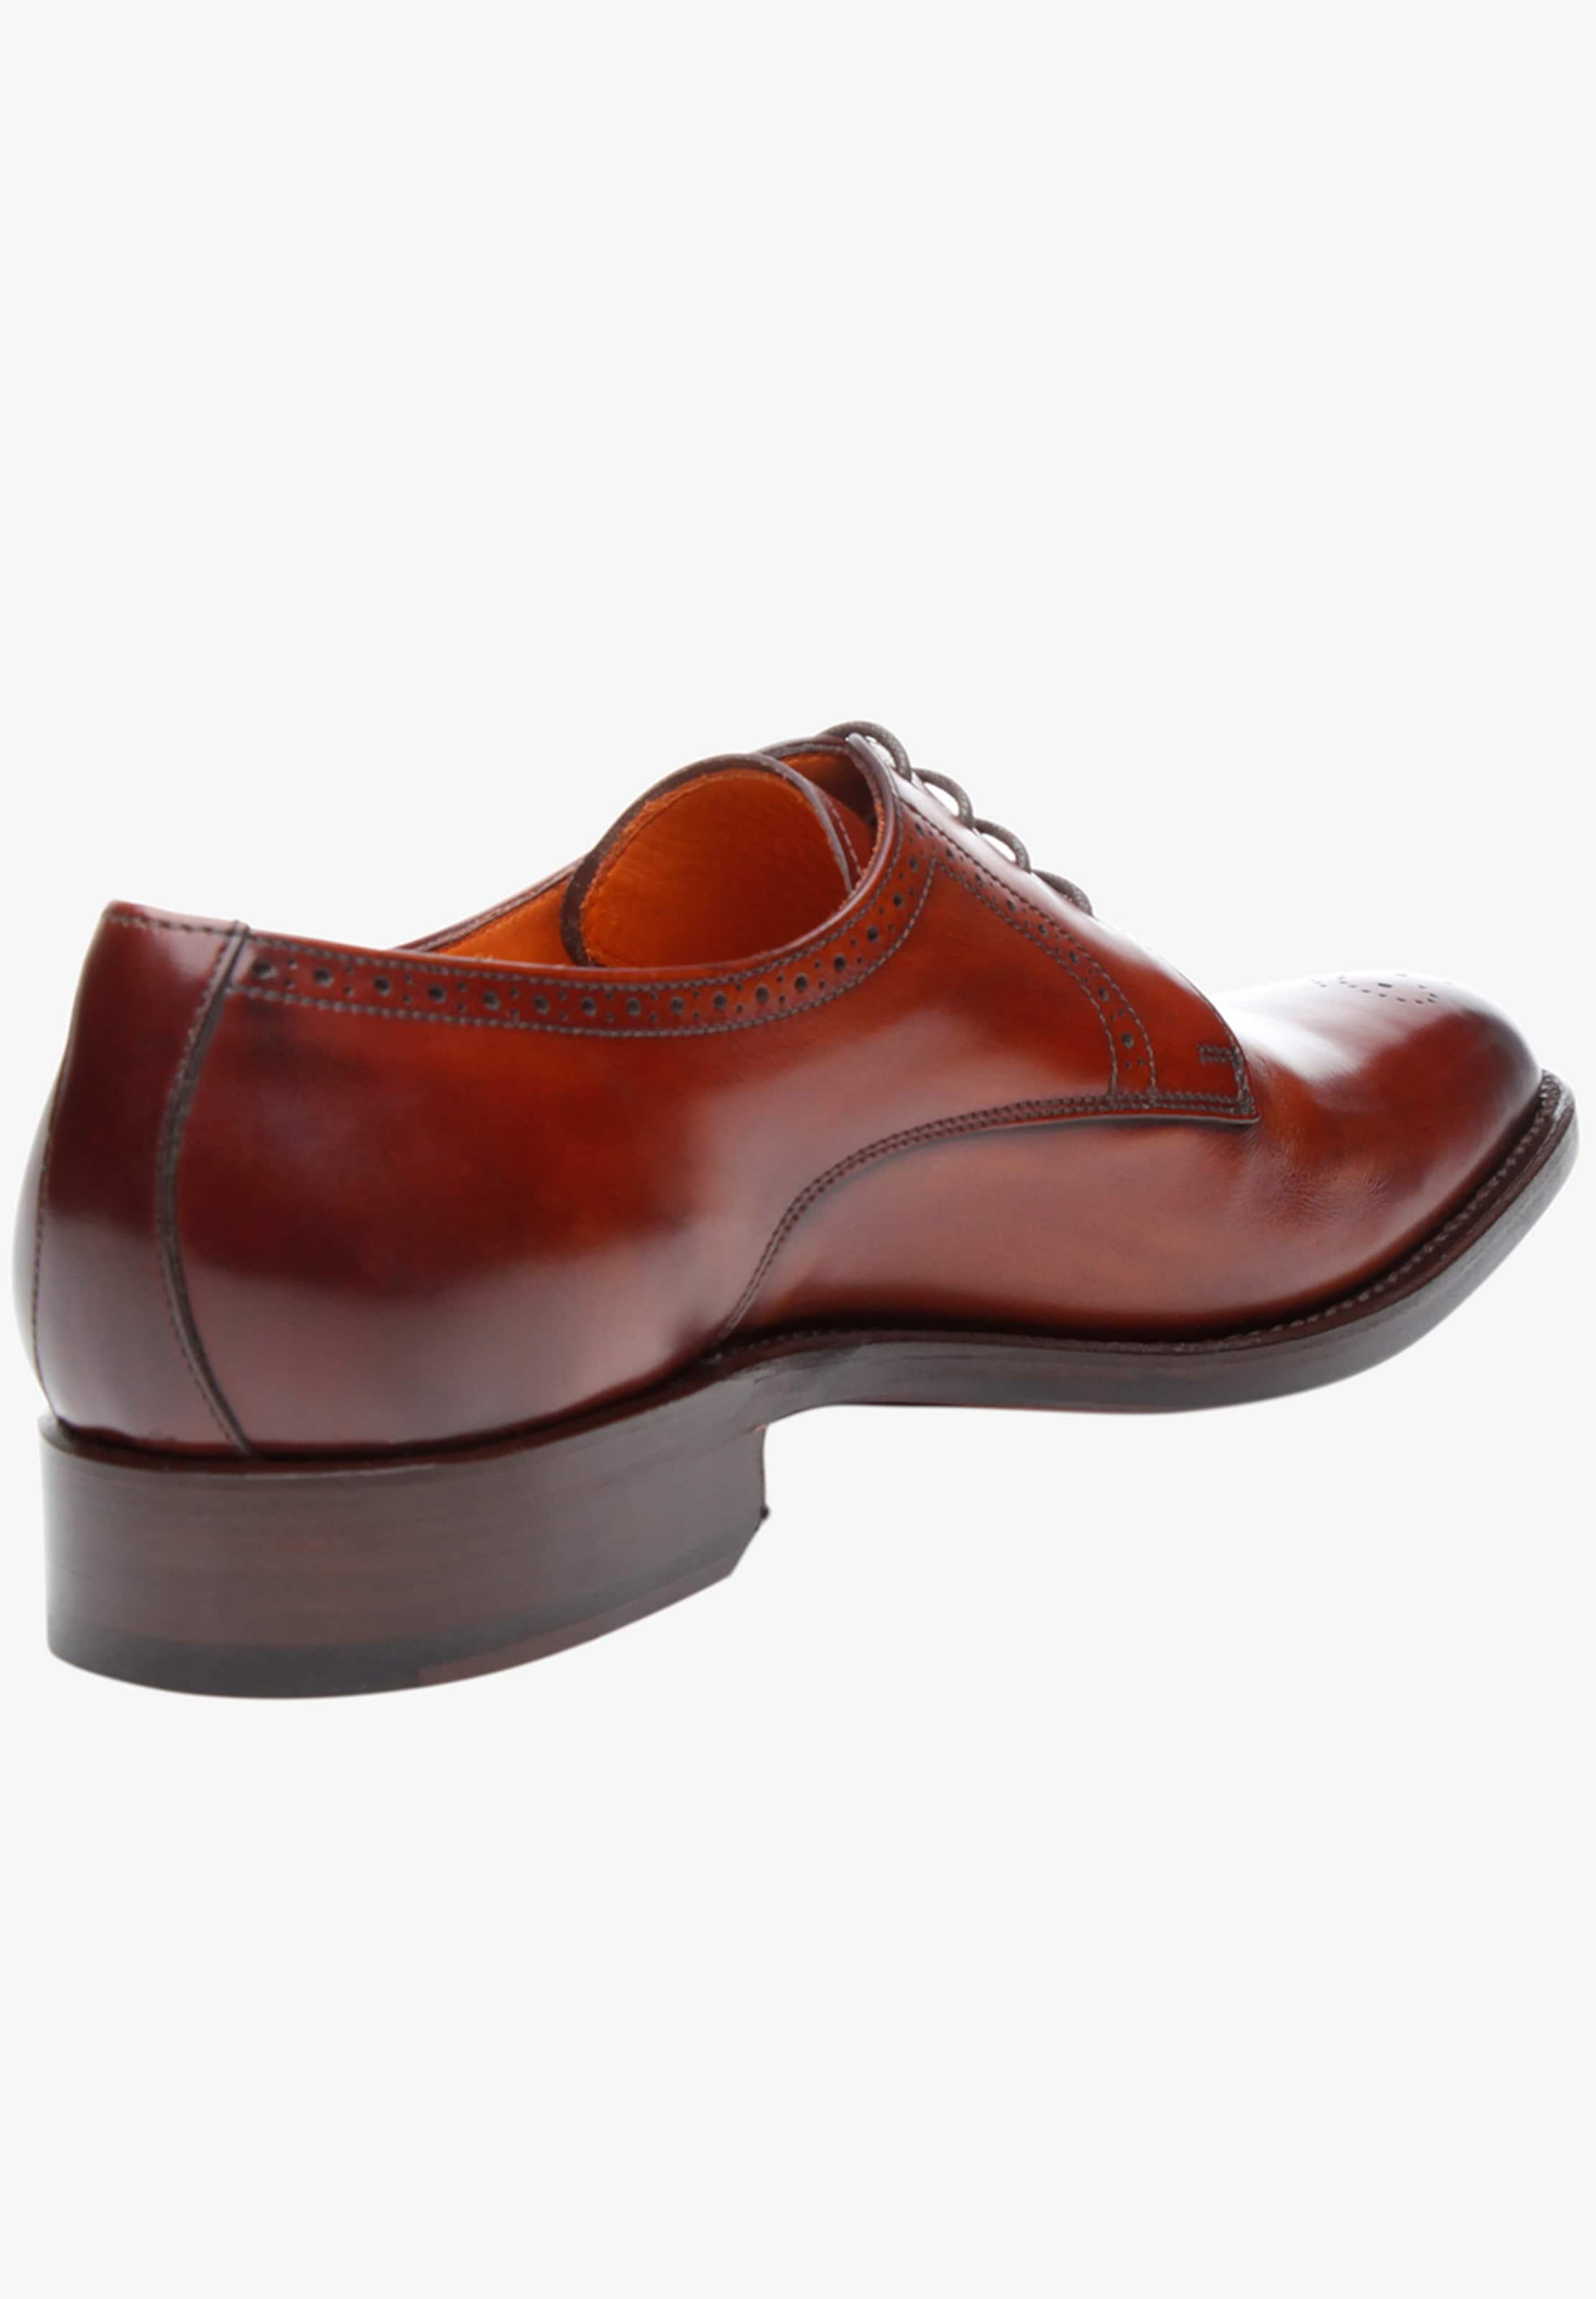 'no5420' Rahmengenäht Halbschuhe Shoepassion In Braun 7gb6yfvY